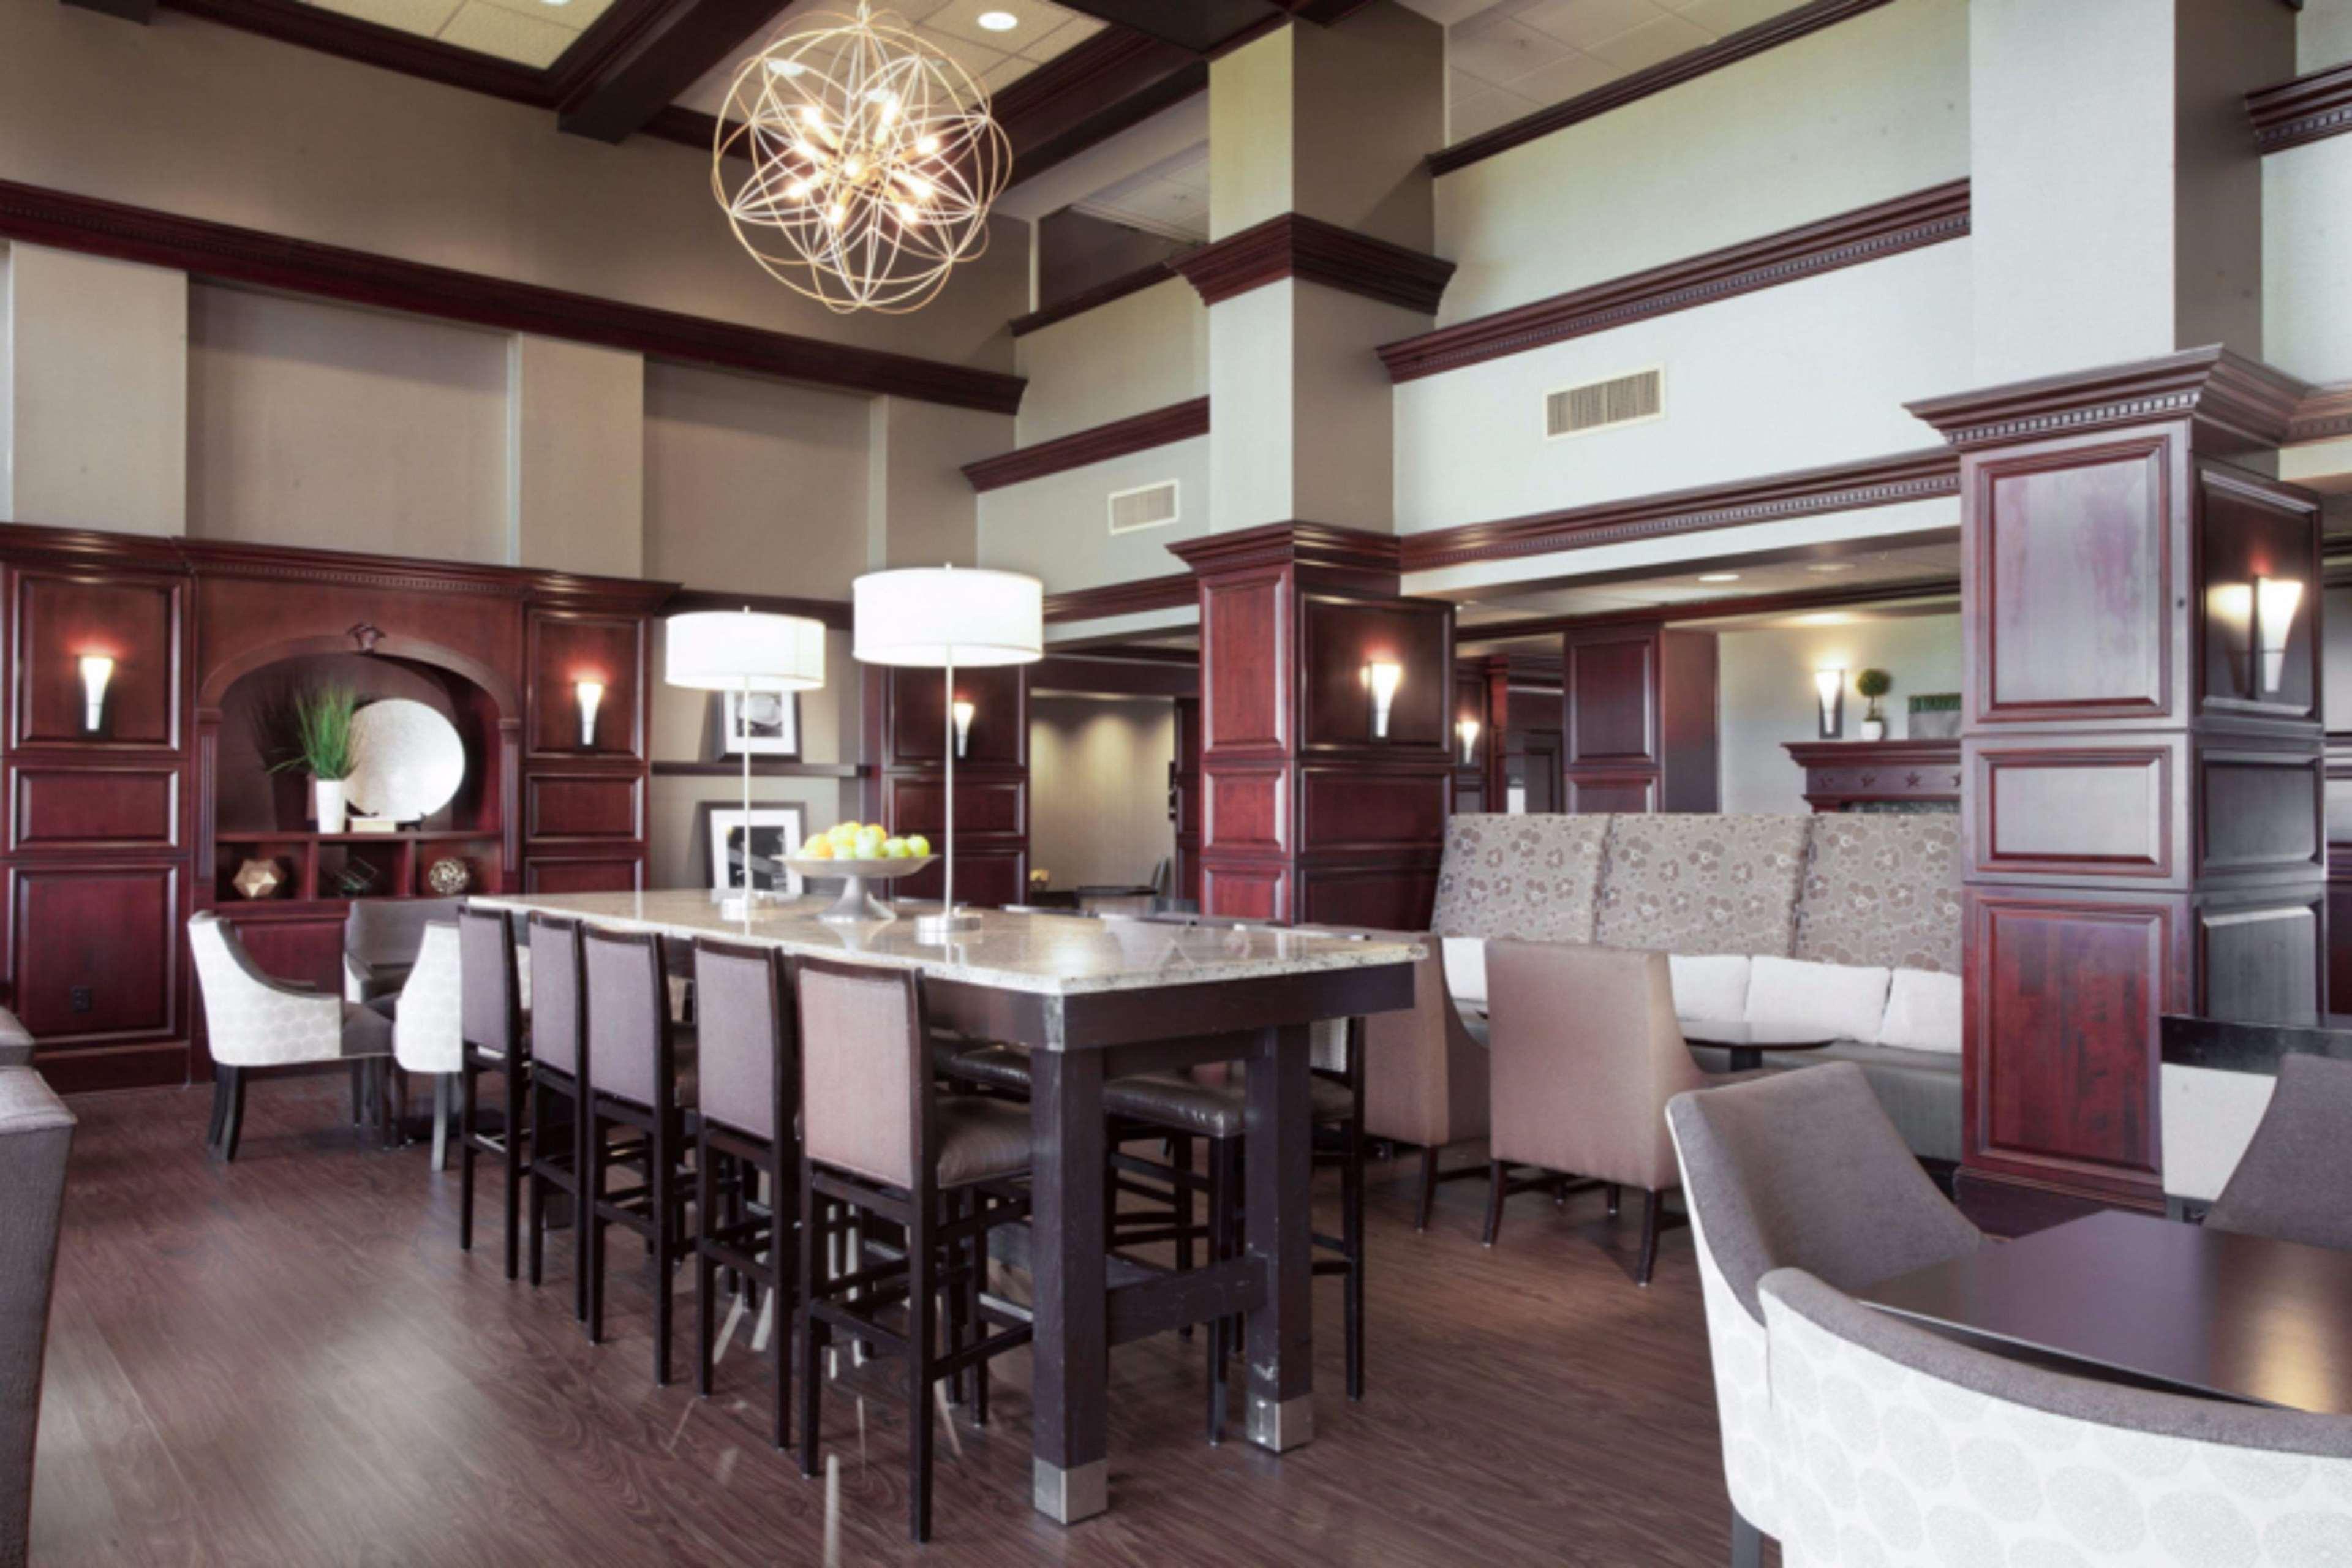 Hampton Inn & Suites Dallas-DFW Airport North-Grapevine image 5